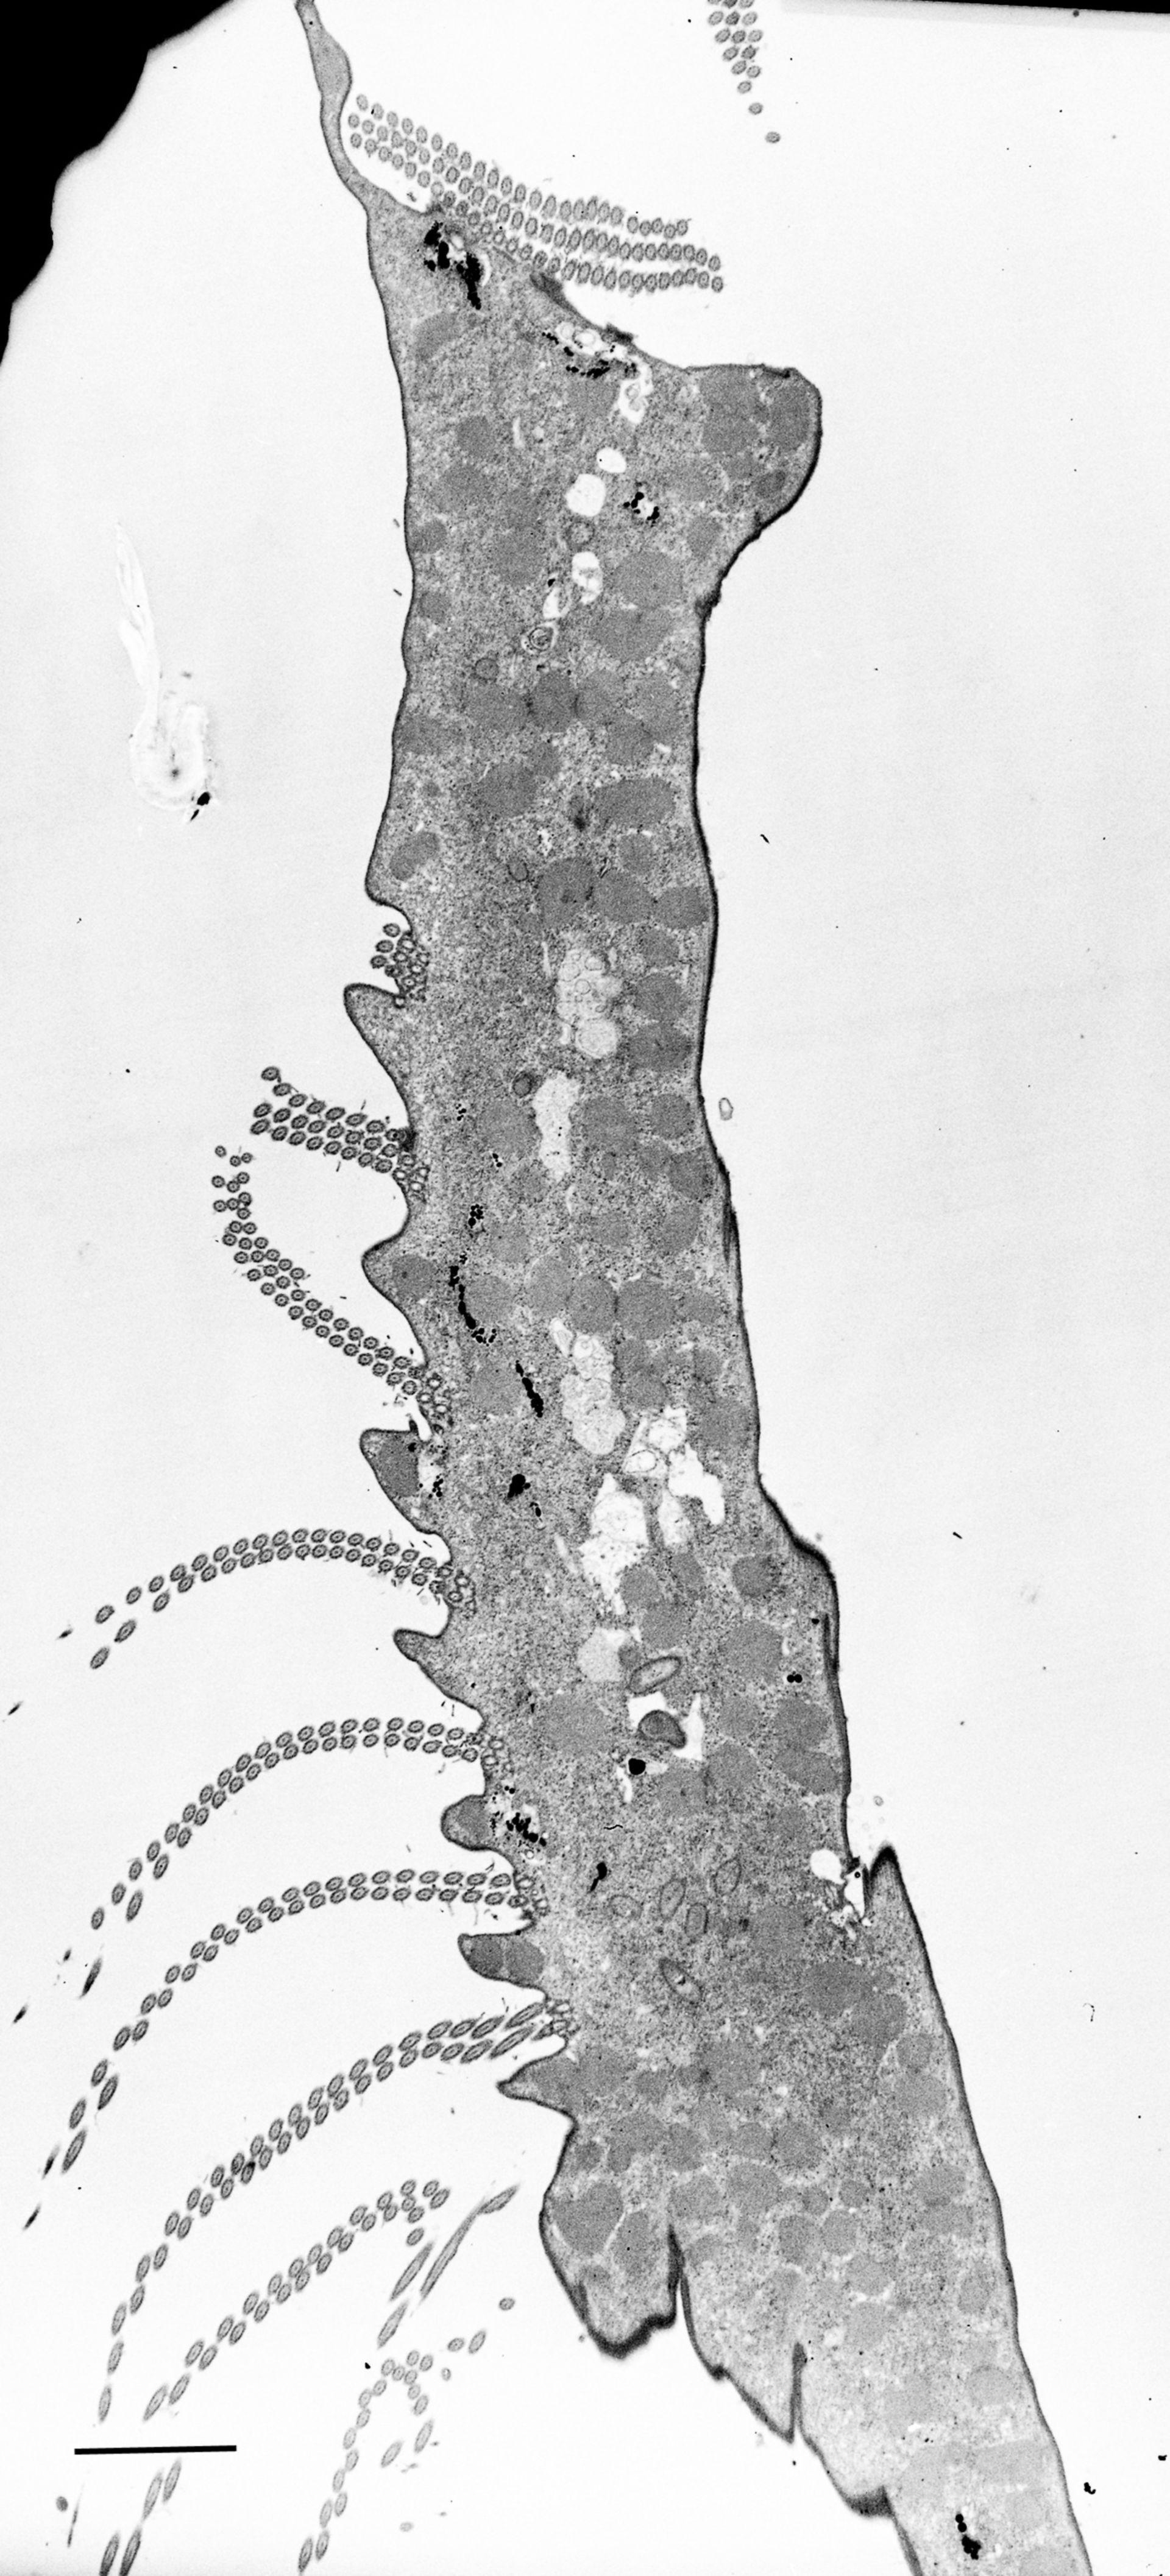 Euplotes sp. (Cytoplasm) - CIL:12337